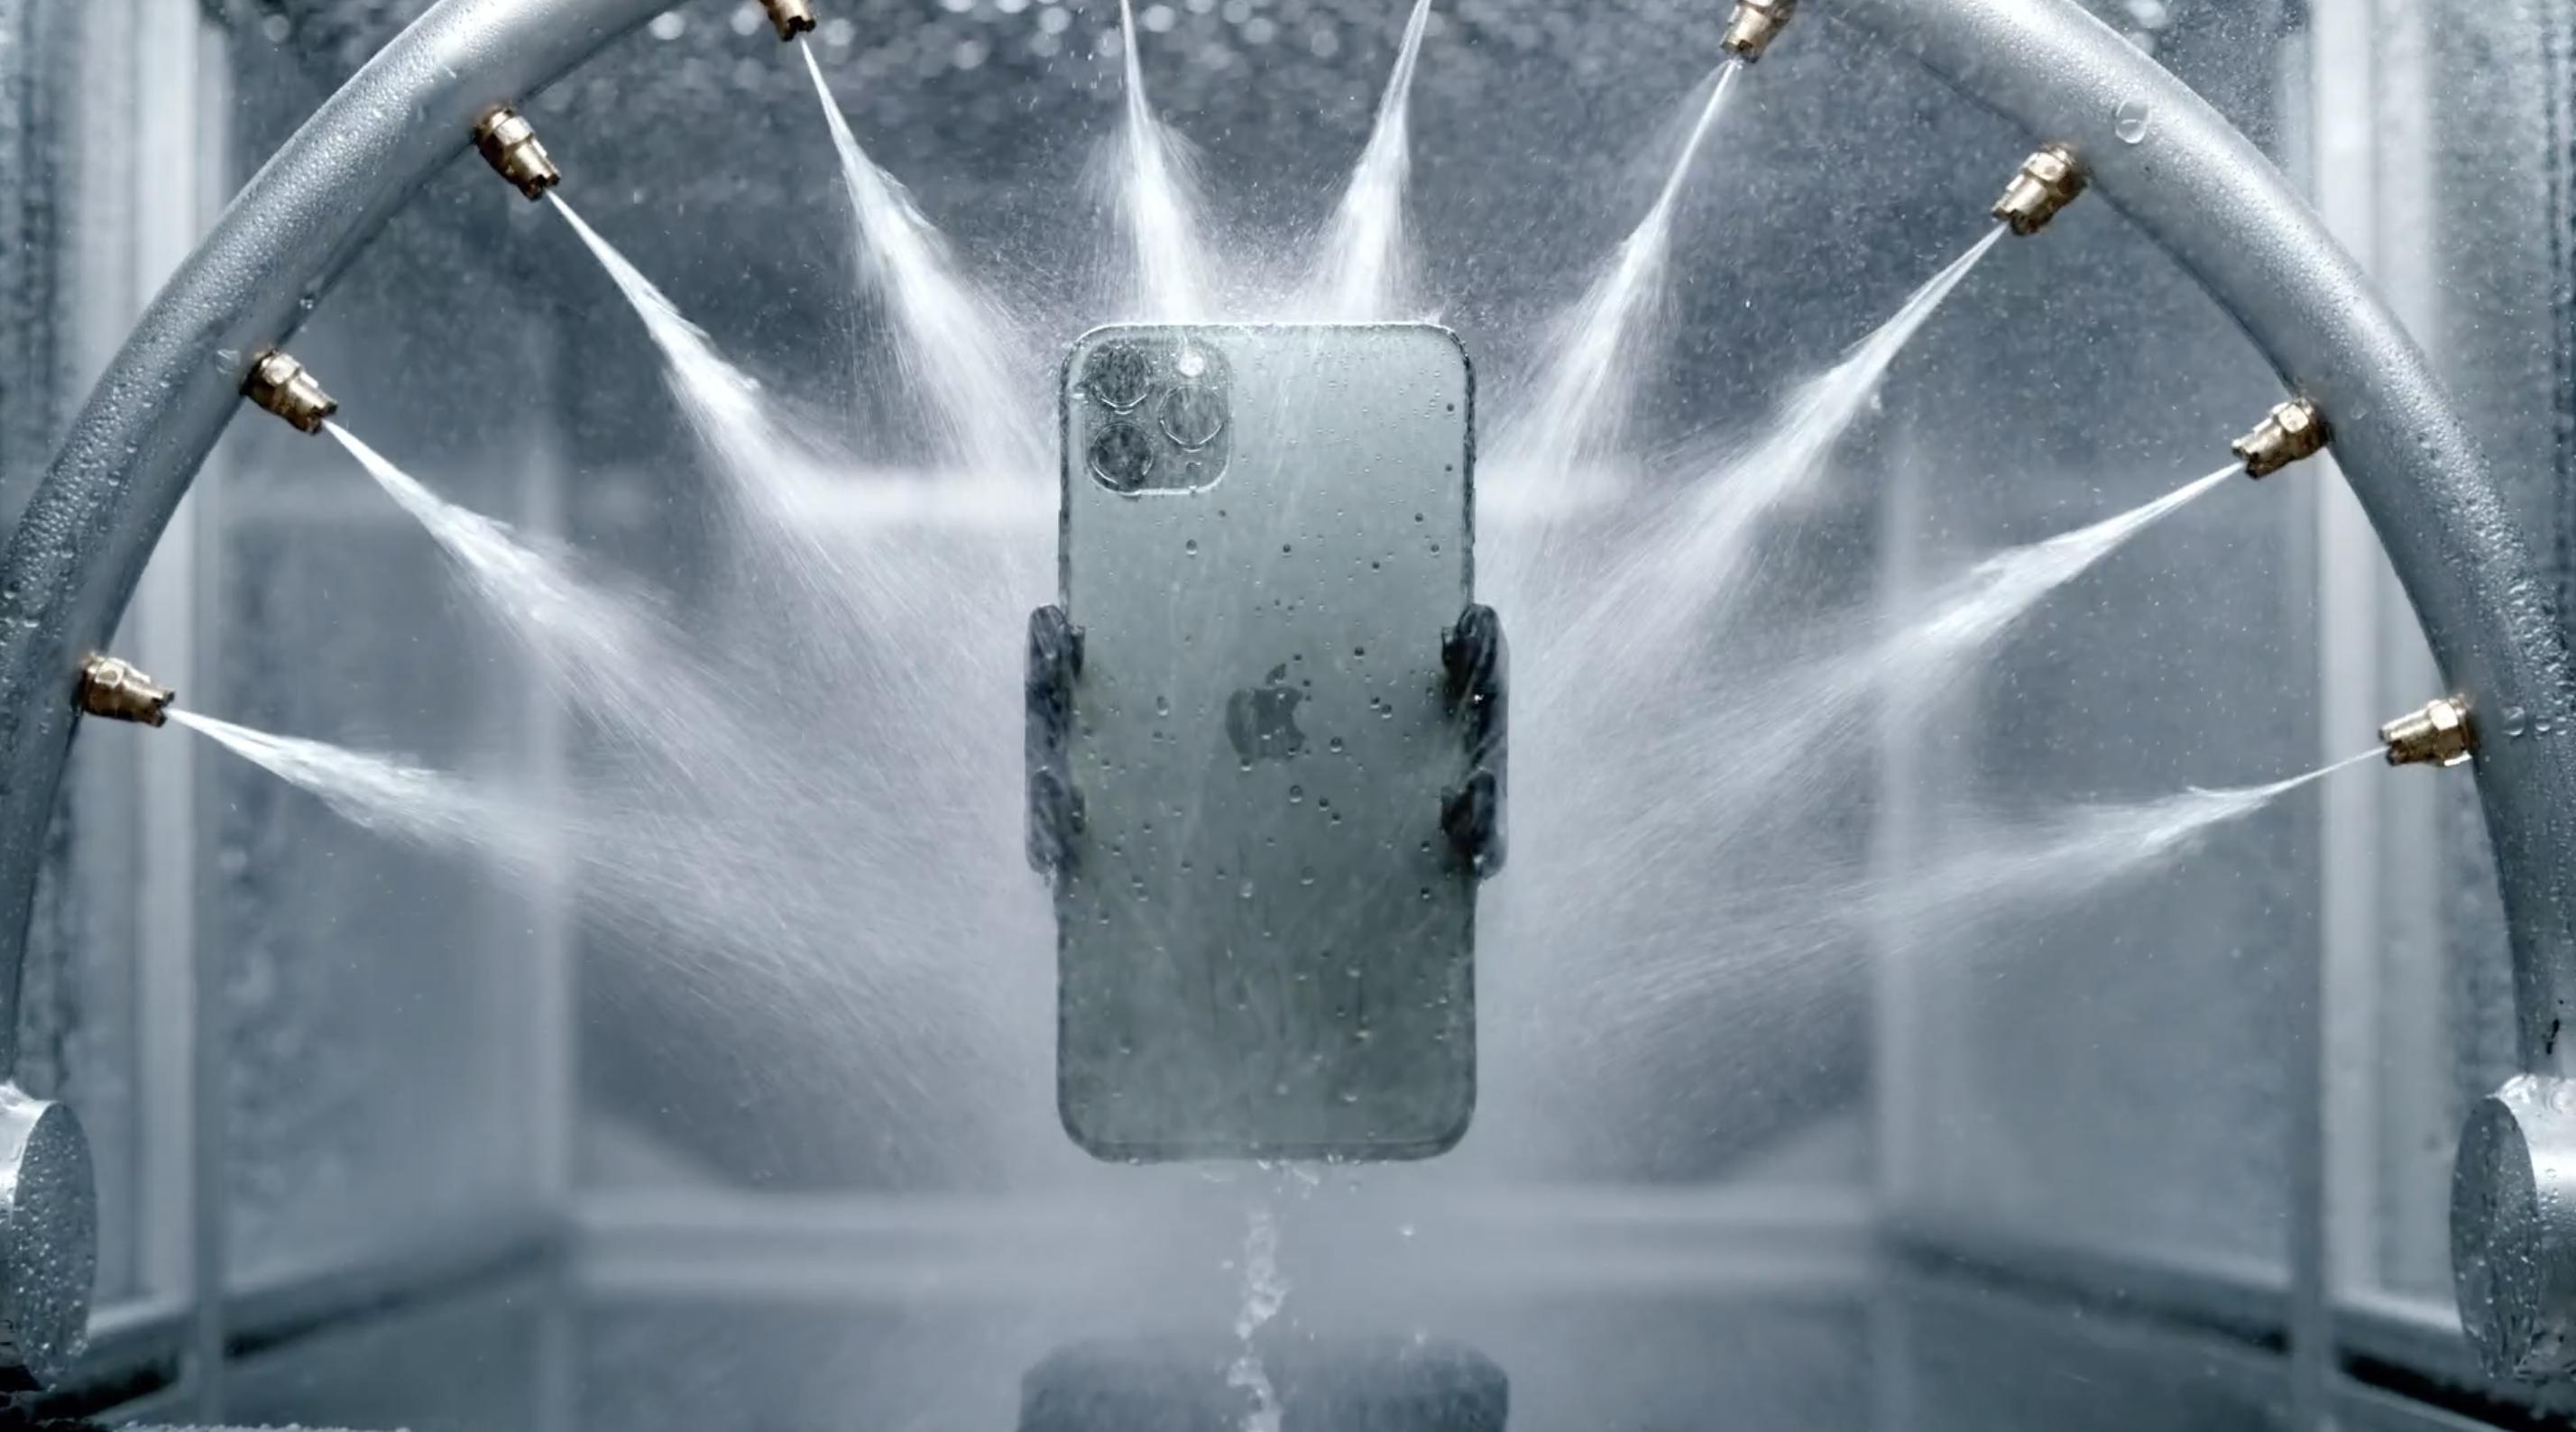 Keynote Septiembre 2019: iPhone 11 Pro prueba de agua